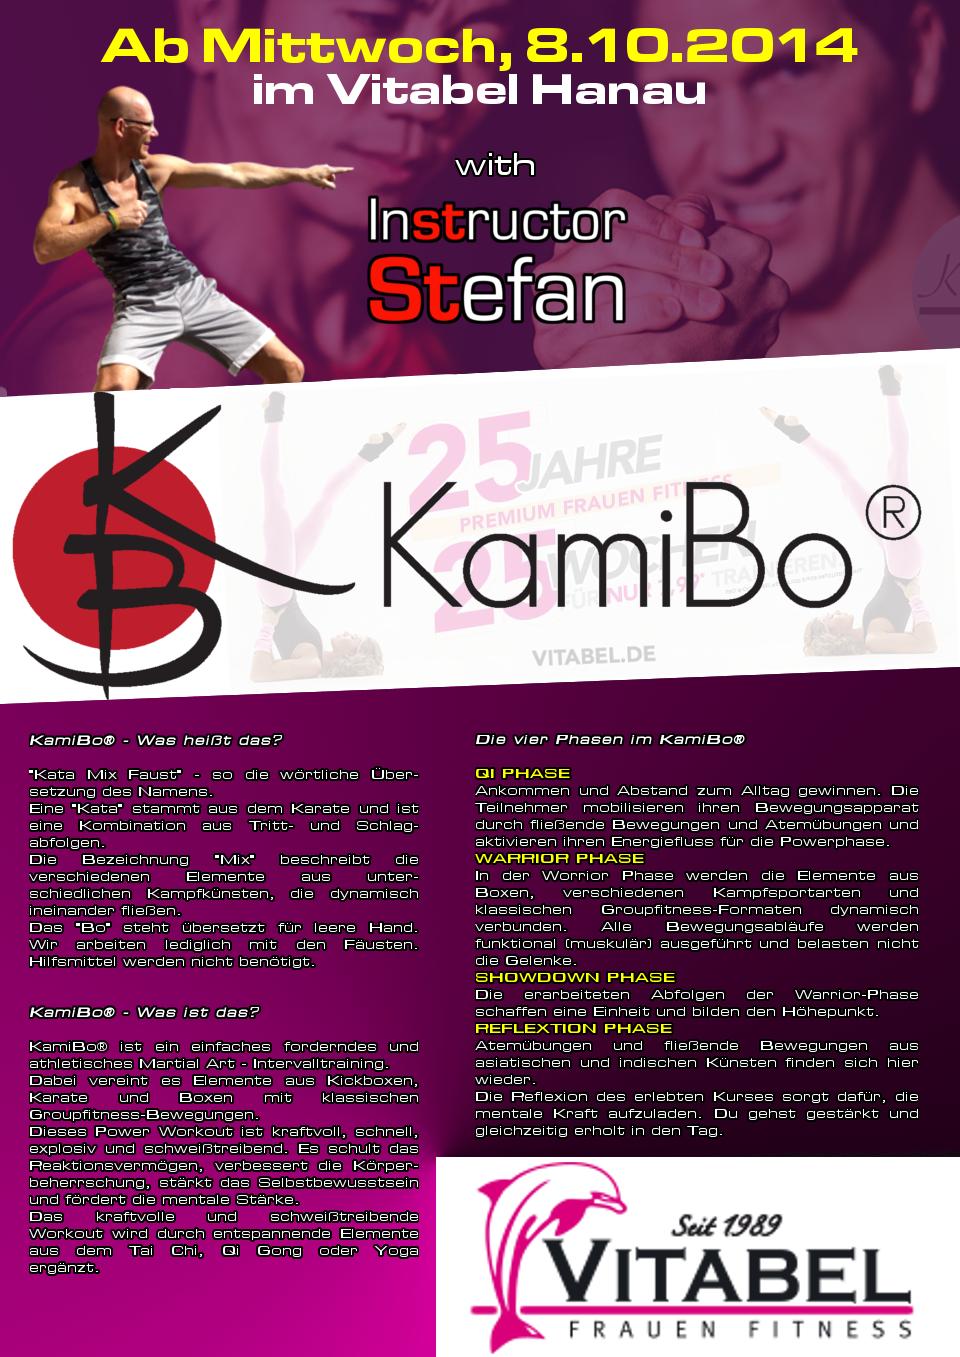 Kamibo